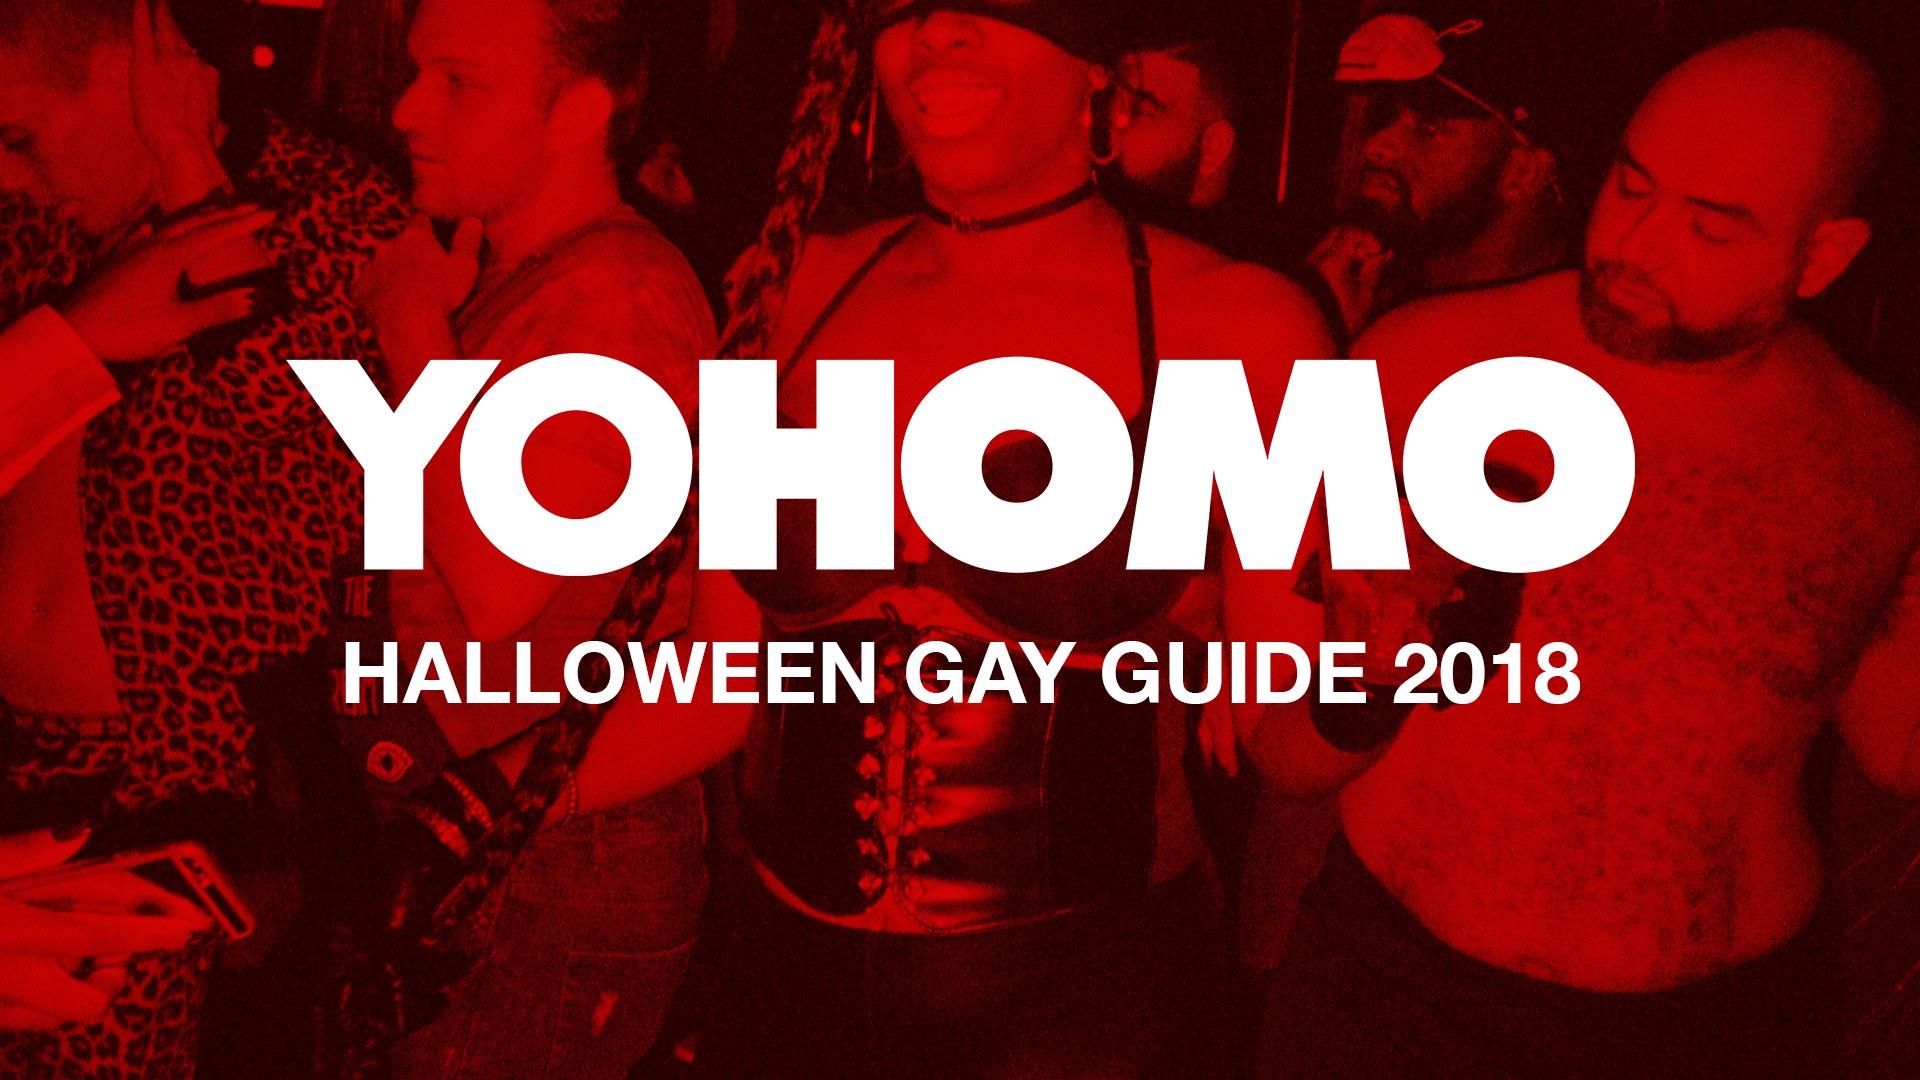 yohomo-halloween-guide